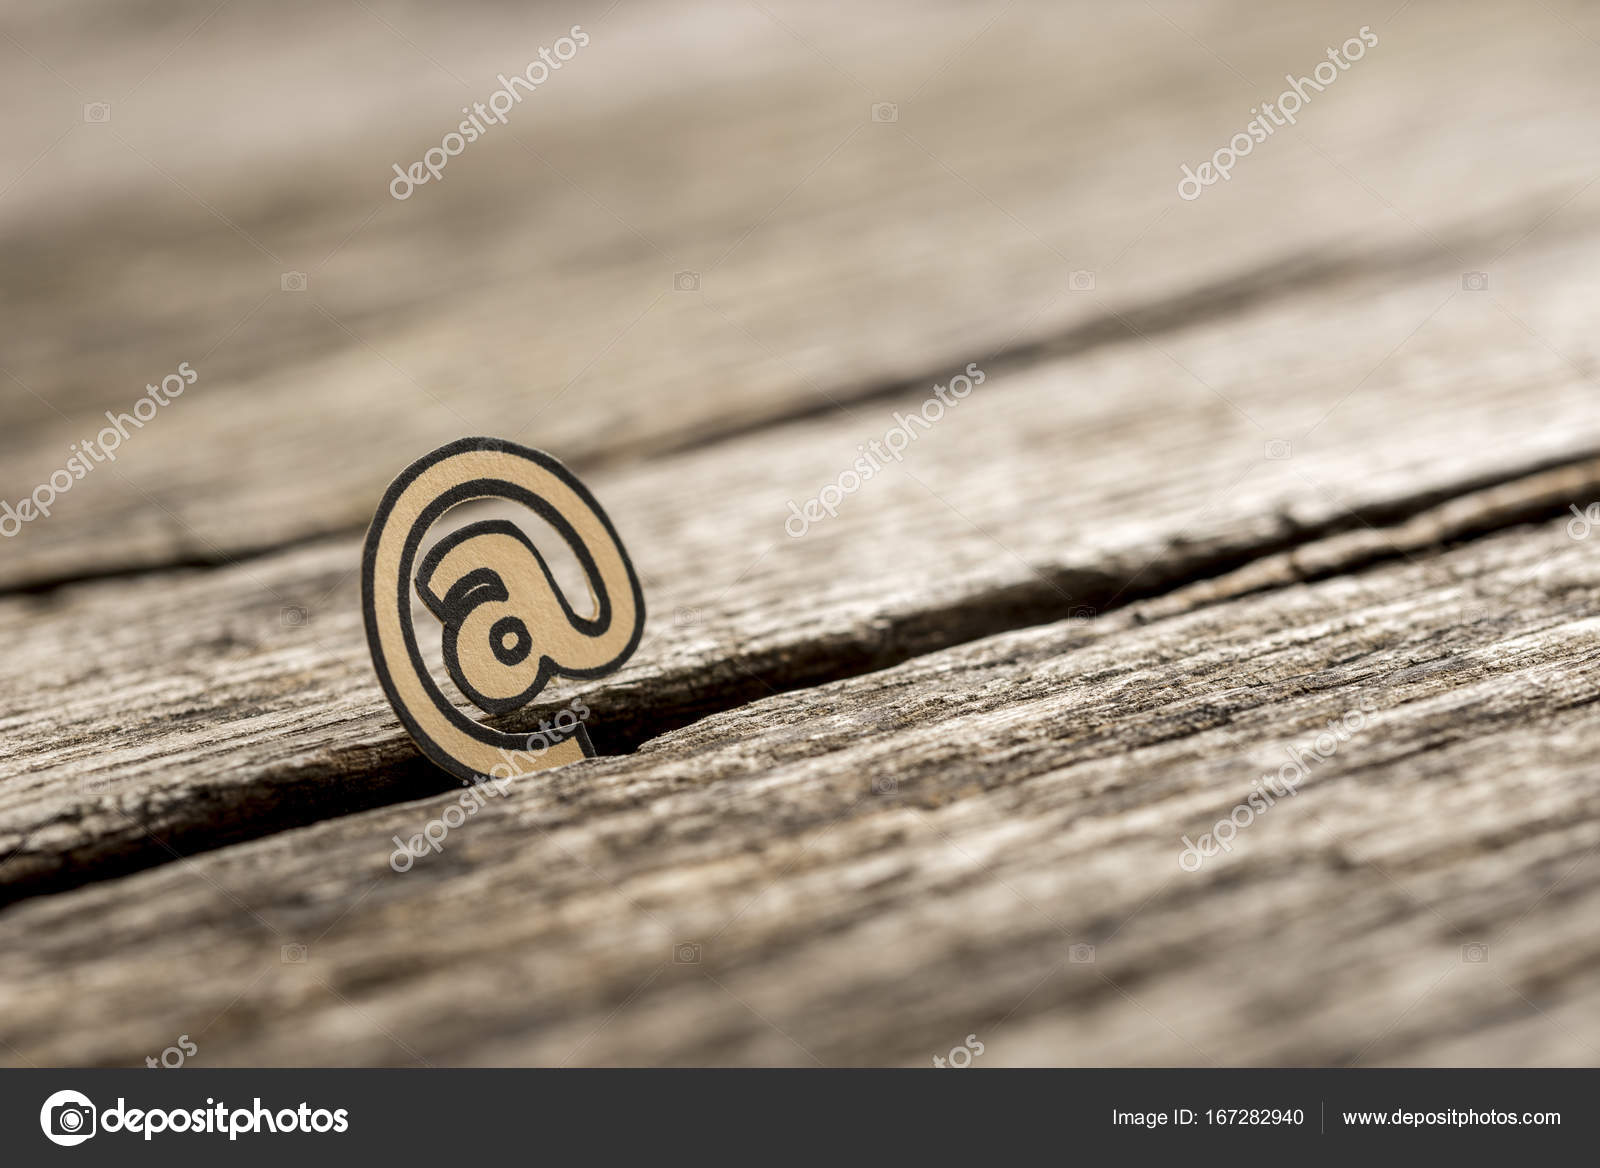 Small At Symbol Stuck In Between Wood Stock Photo Gajus Images